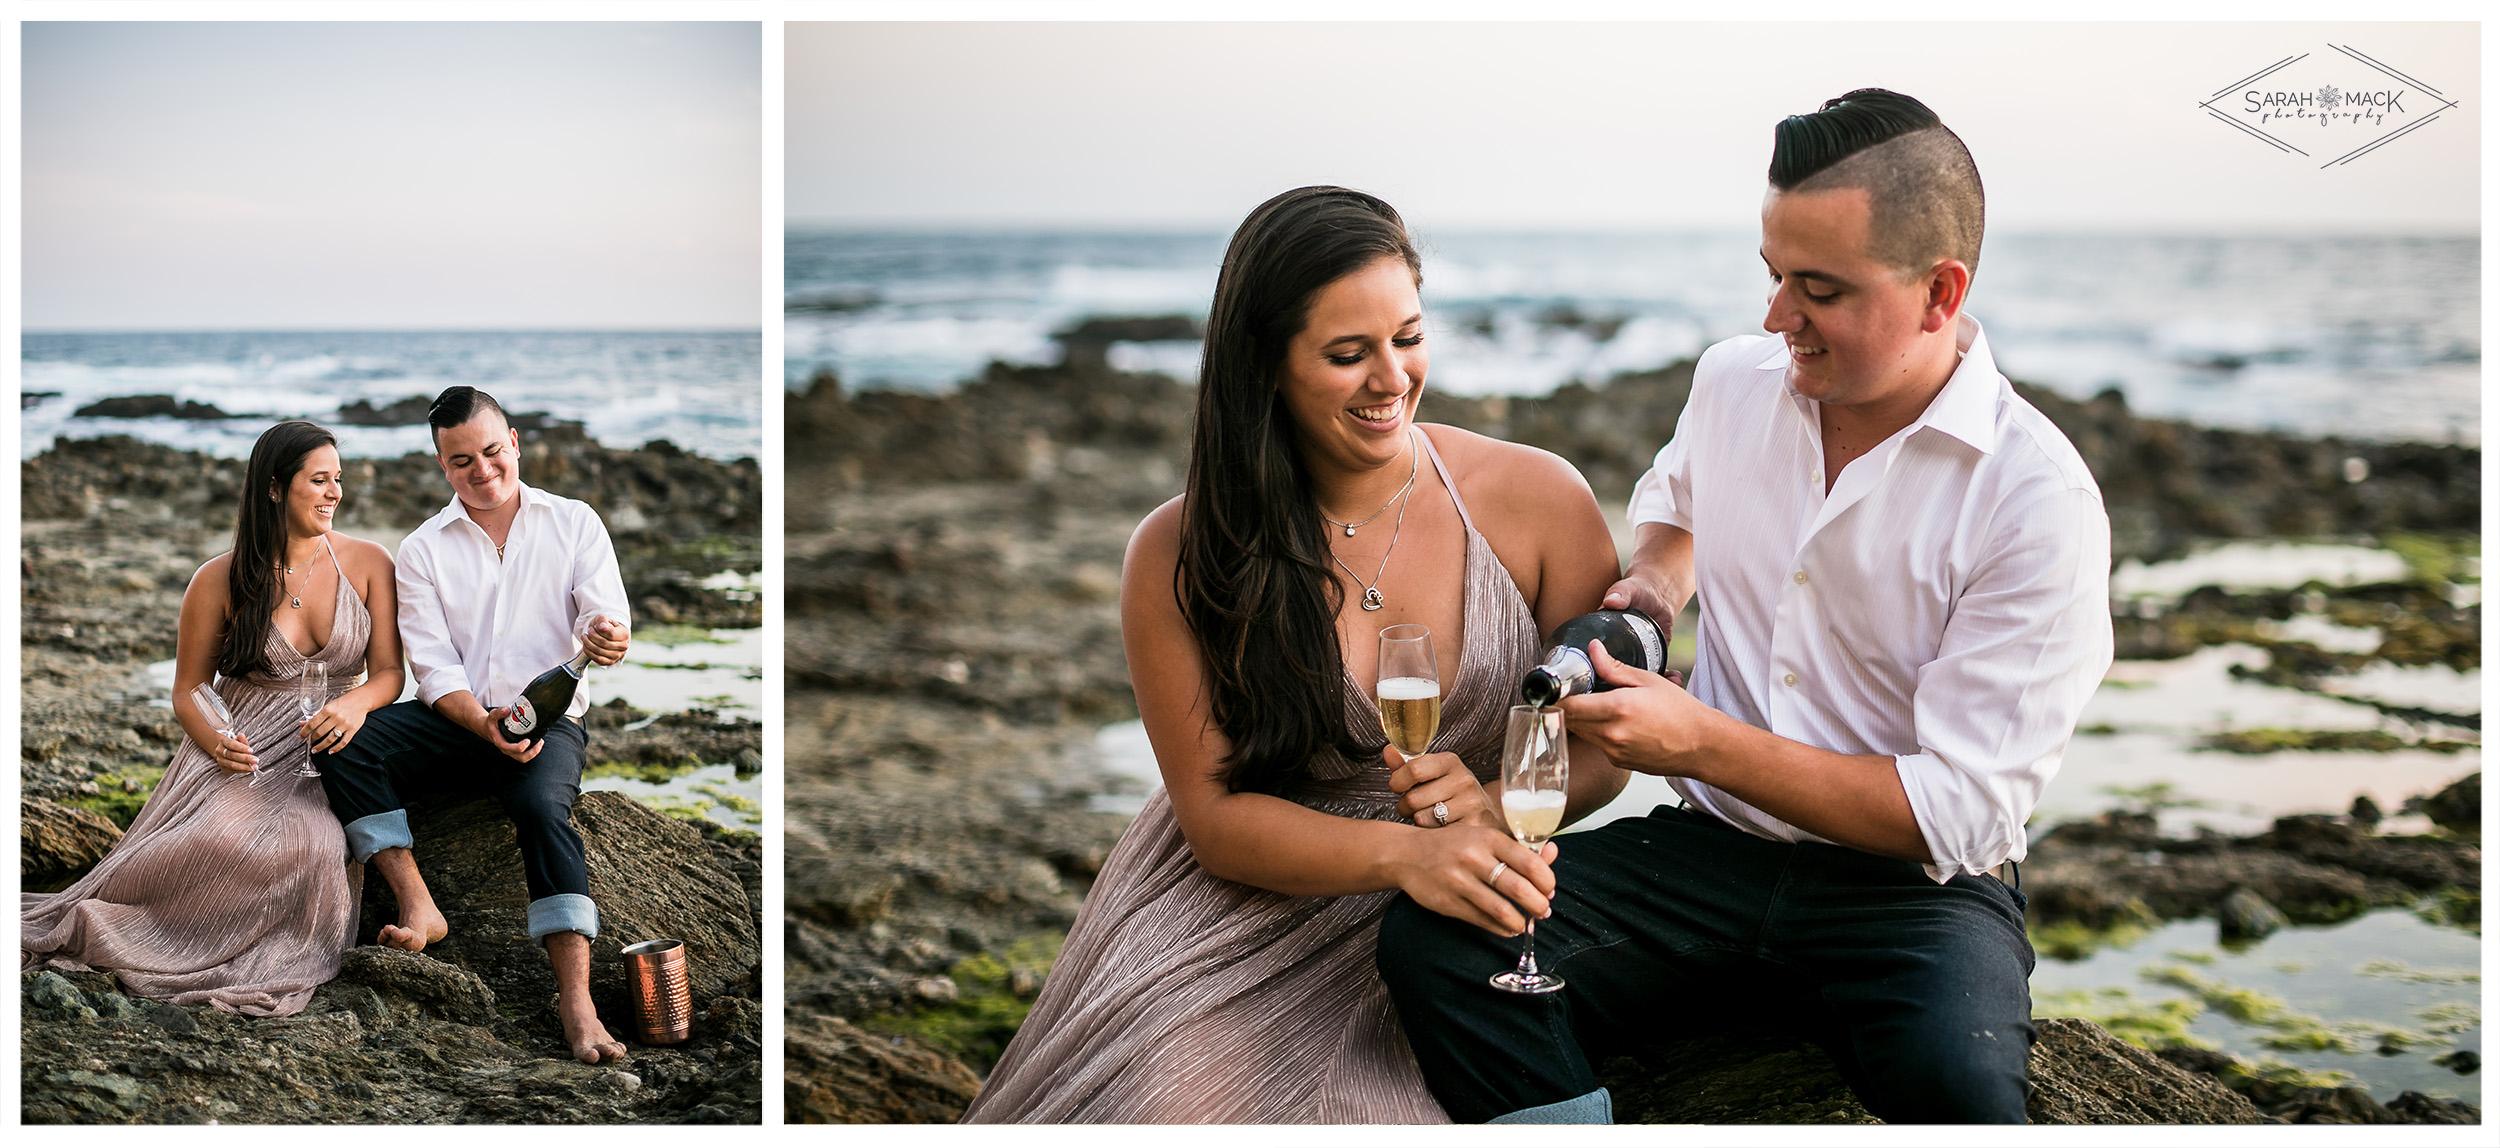 TM-Laguna-Beach-Orange-County-Engagement-Photography-15.jpg